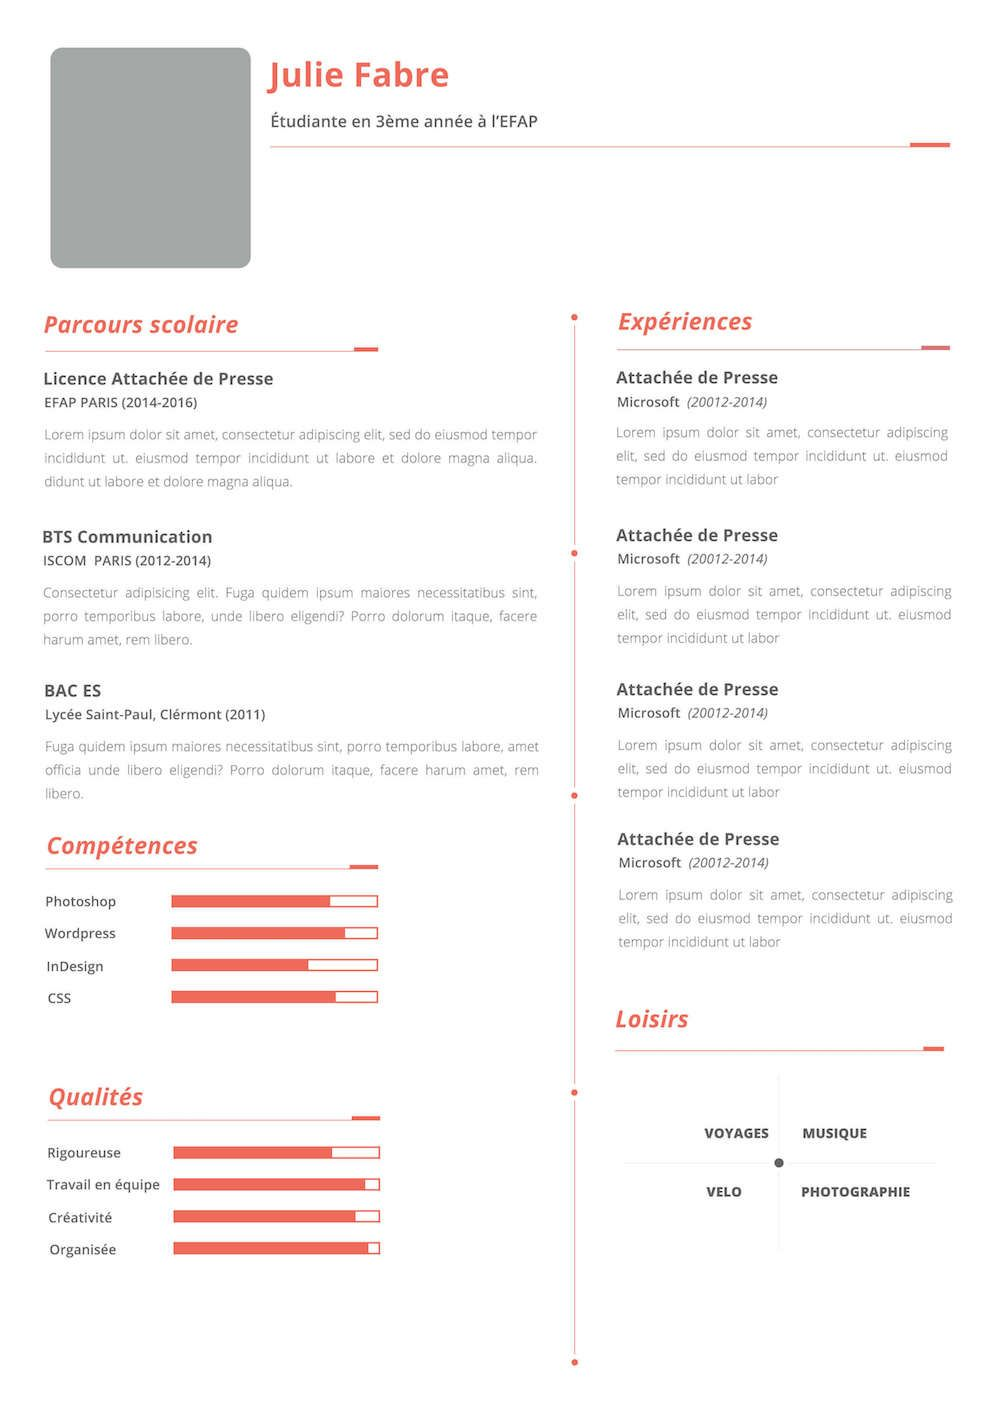 CV étudiant + LM Cv étudiant, Etudiant, Cv créatif